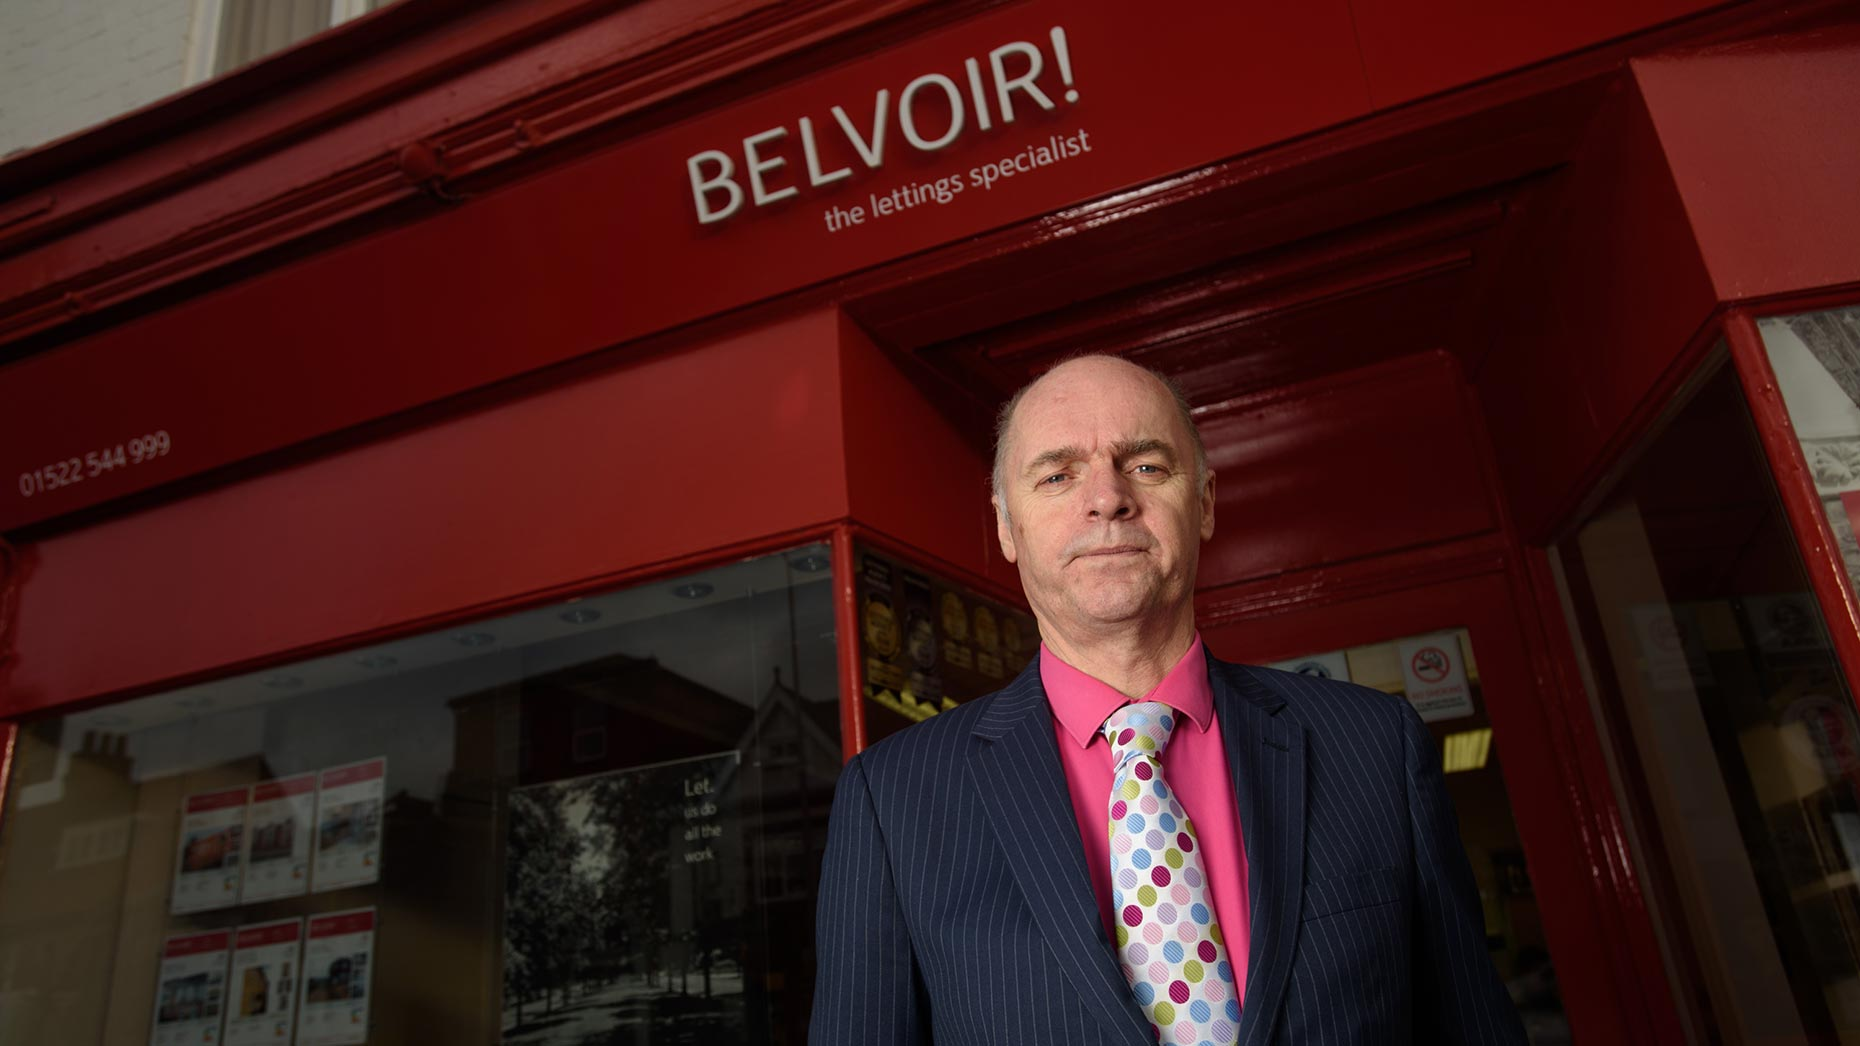 Paul Collins, Managing Director of Belvoir Lettings